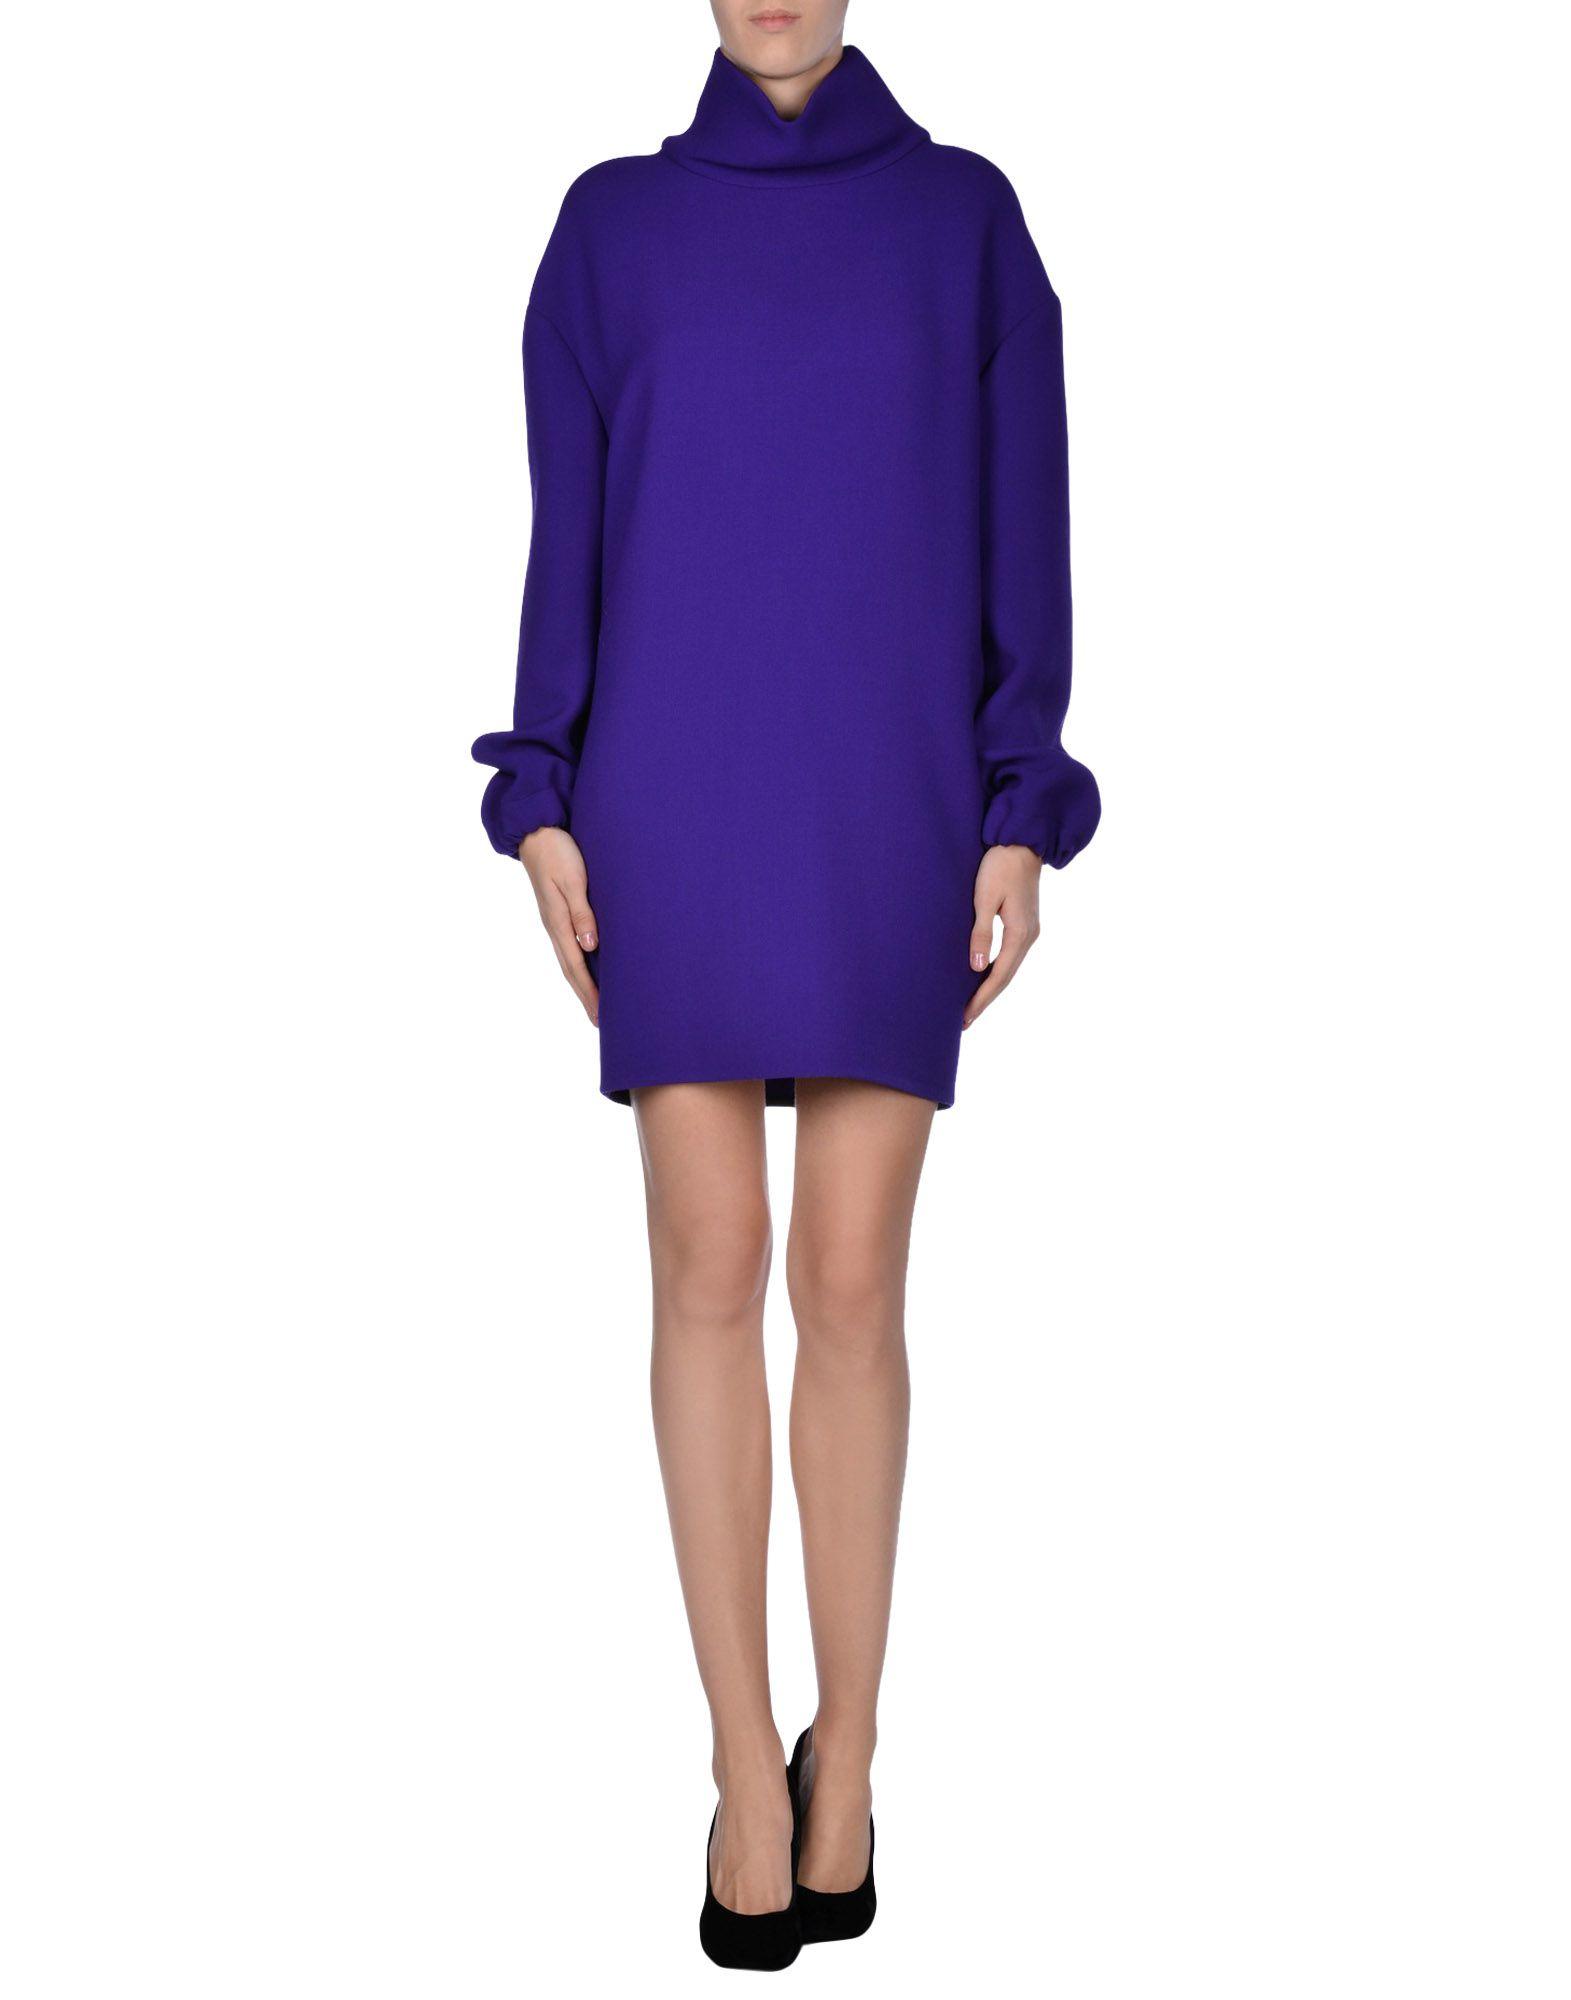 Gallery  sc 1 st  Lyst & Lyst - Costume National Short Dress in Purple